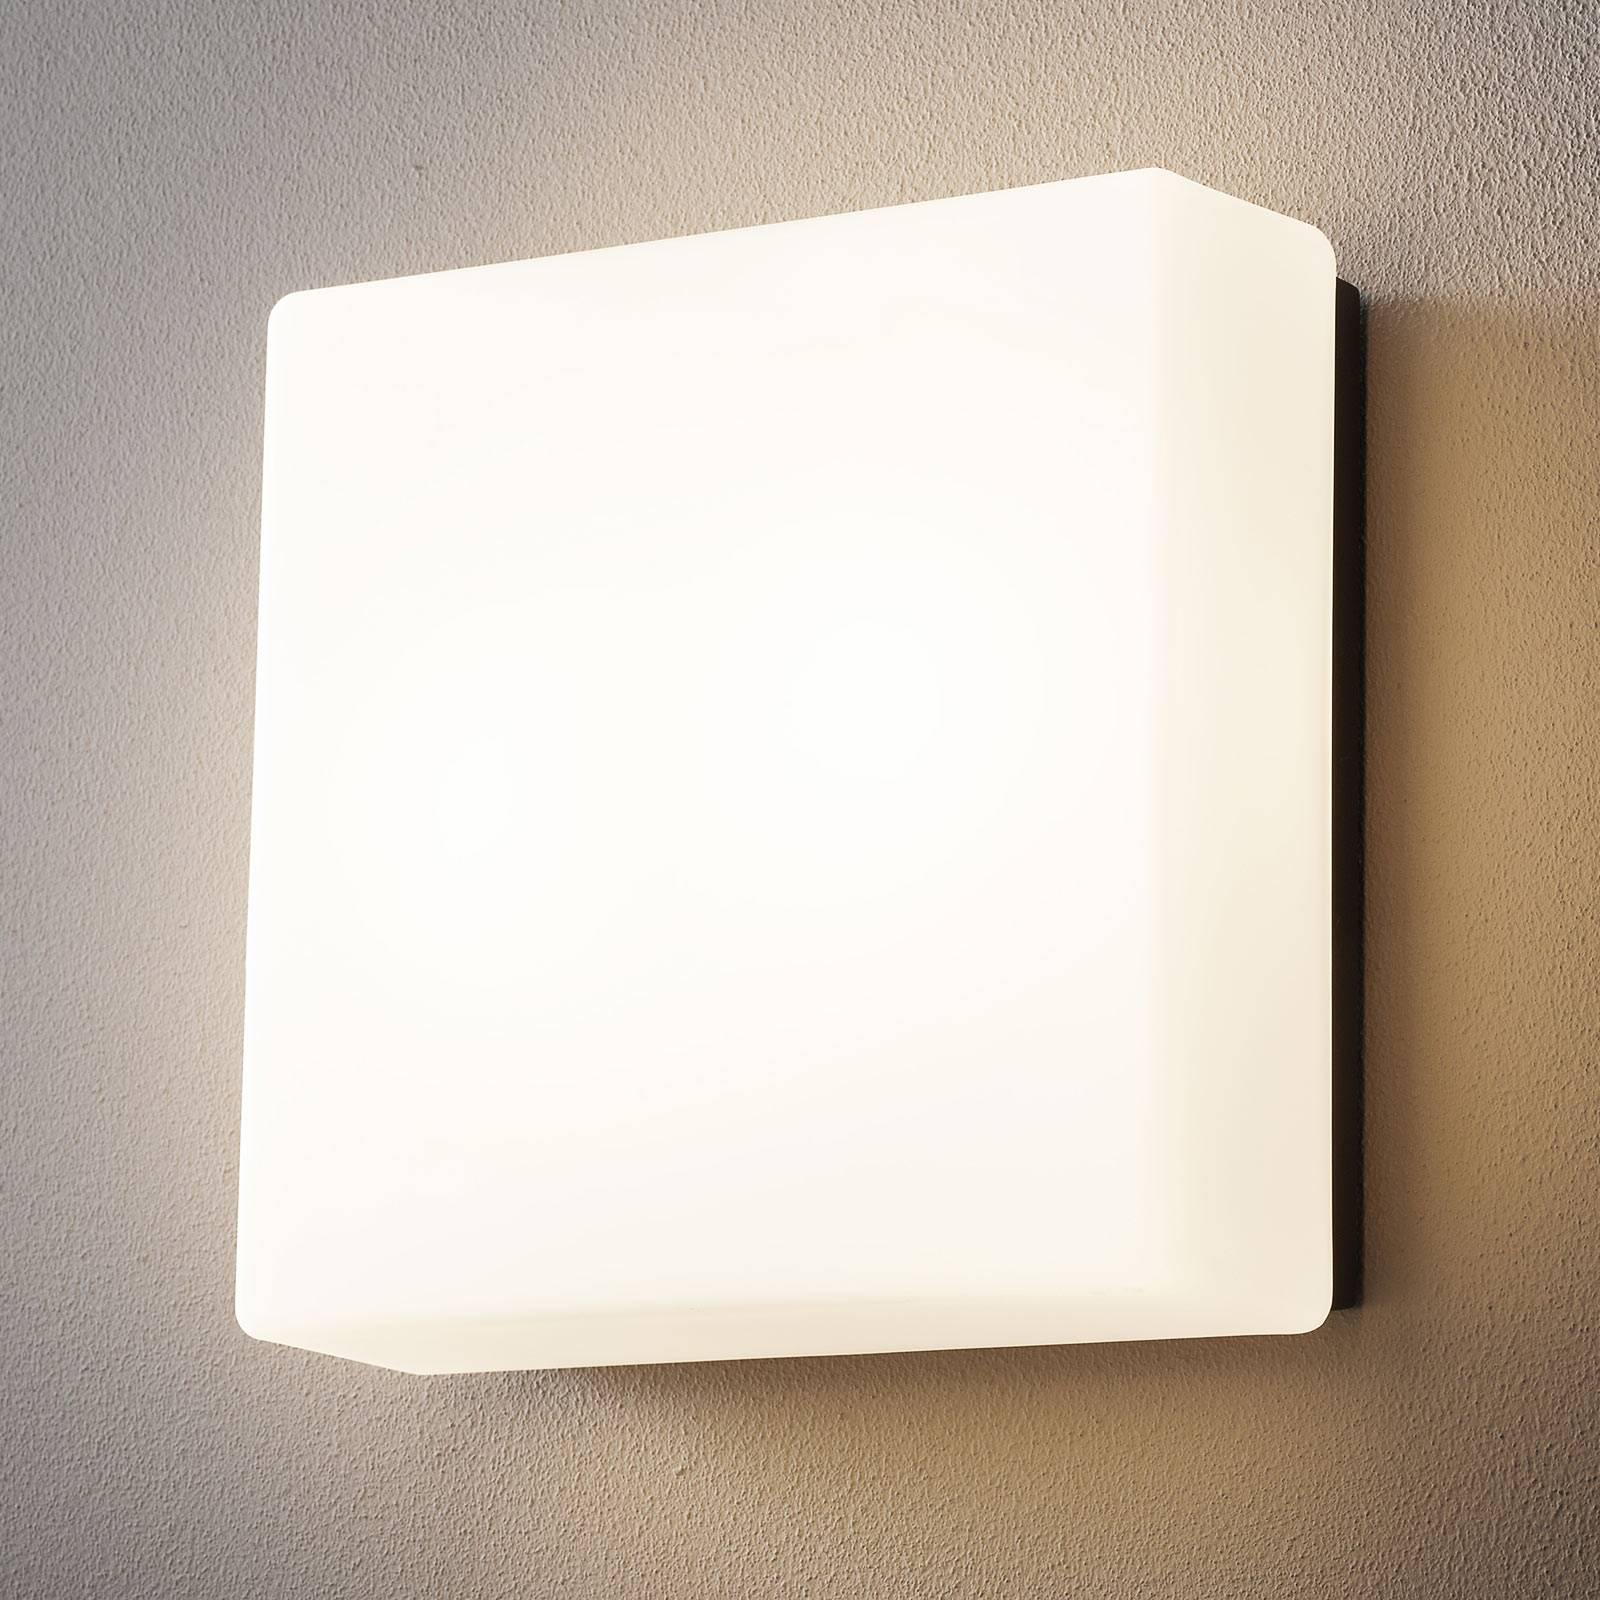 BEGA Lichtbaustein 38302 LED-Wandleuchte 32x32 cm